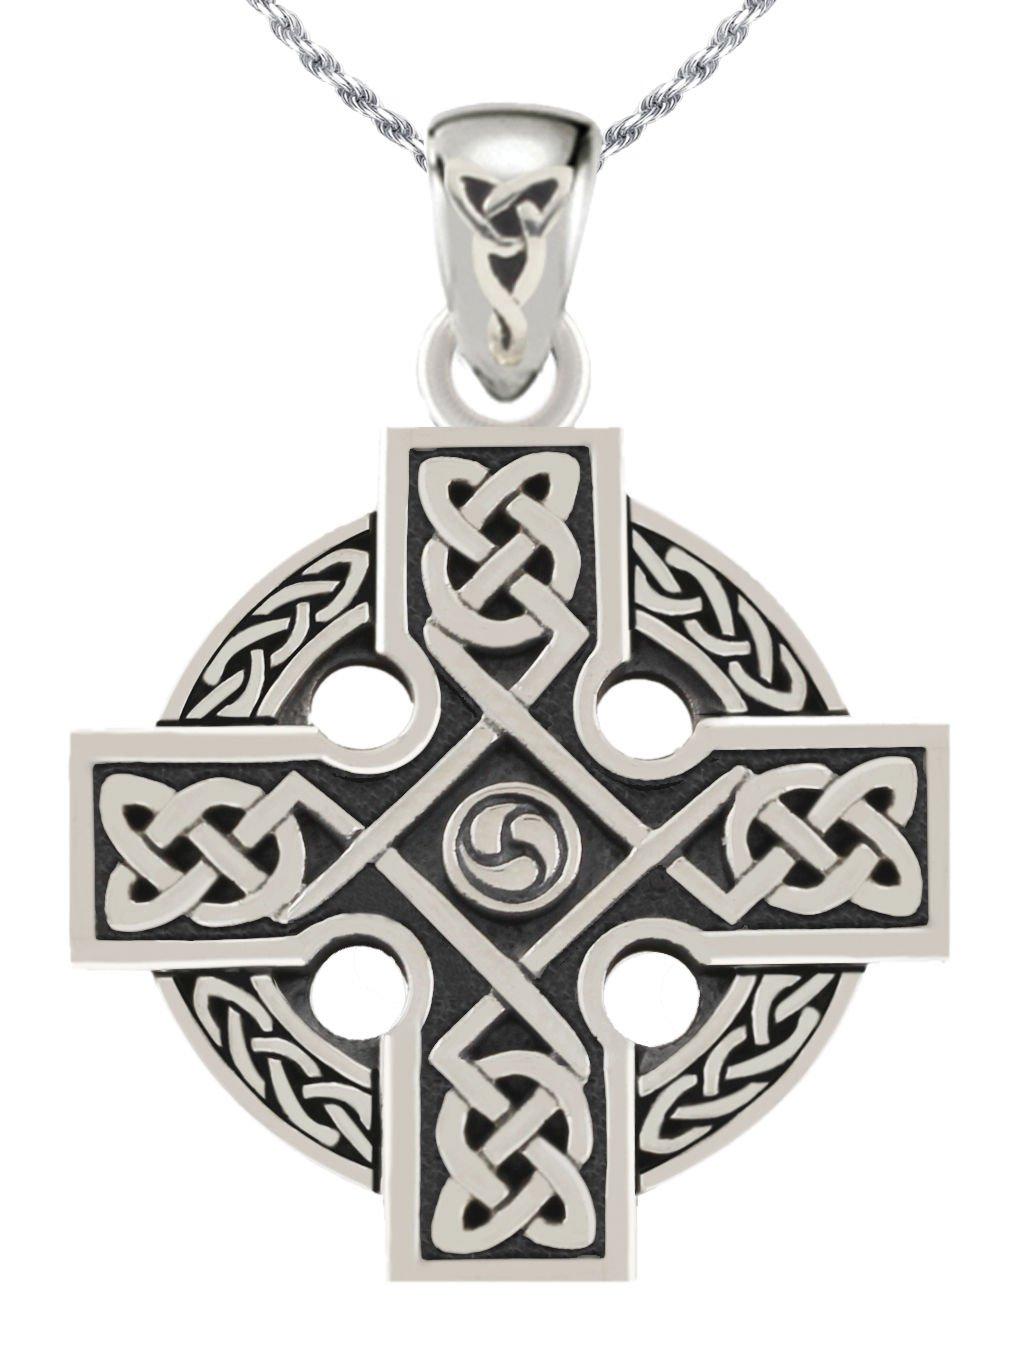 Men's 0.925 Sterling Silver Irish Celtic Knotwork Cross Pendant 2.0mm Curb Necklace, 24''